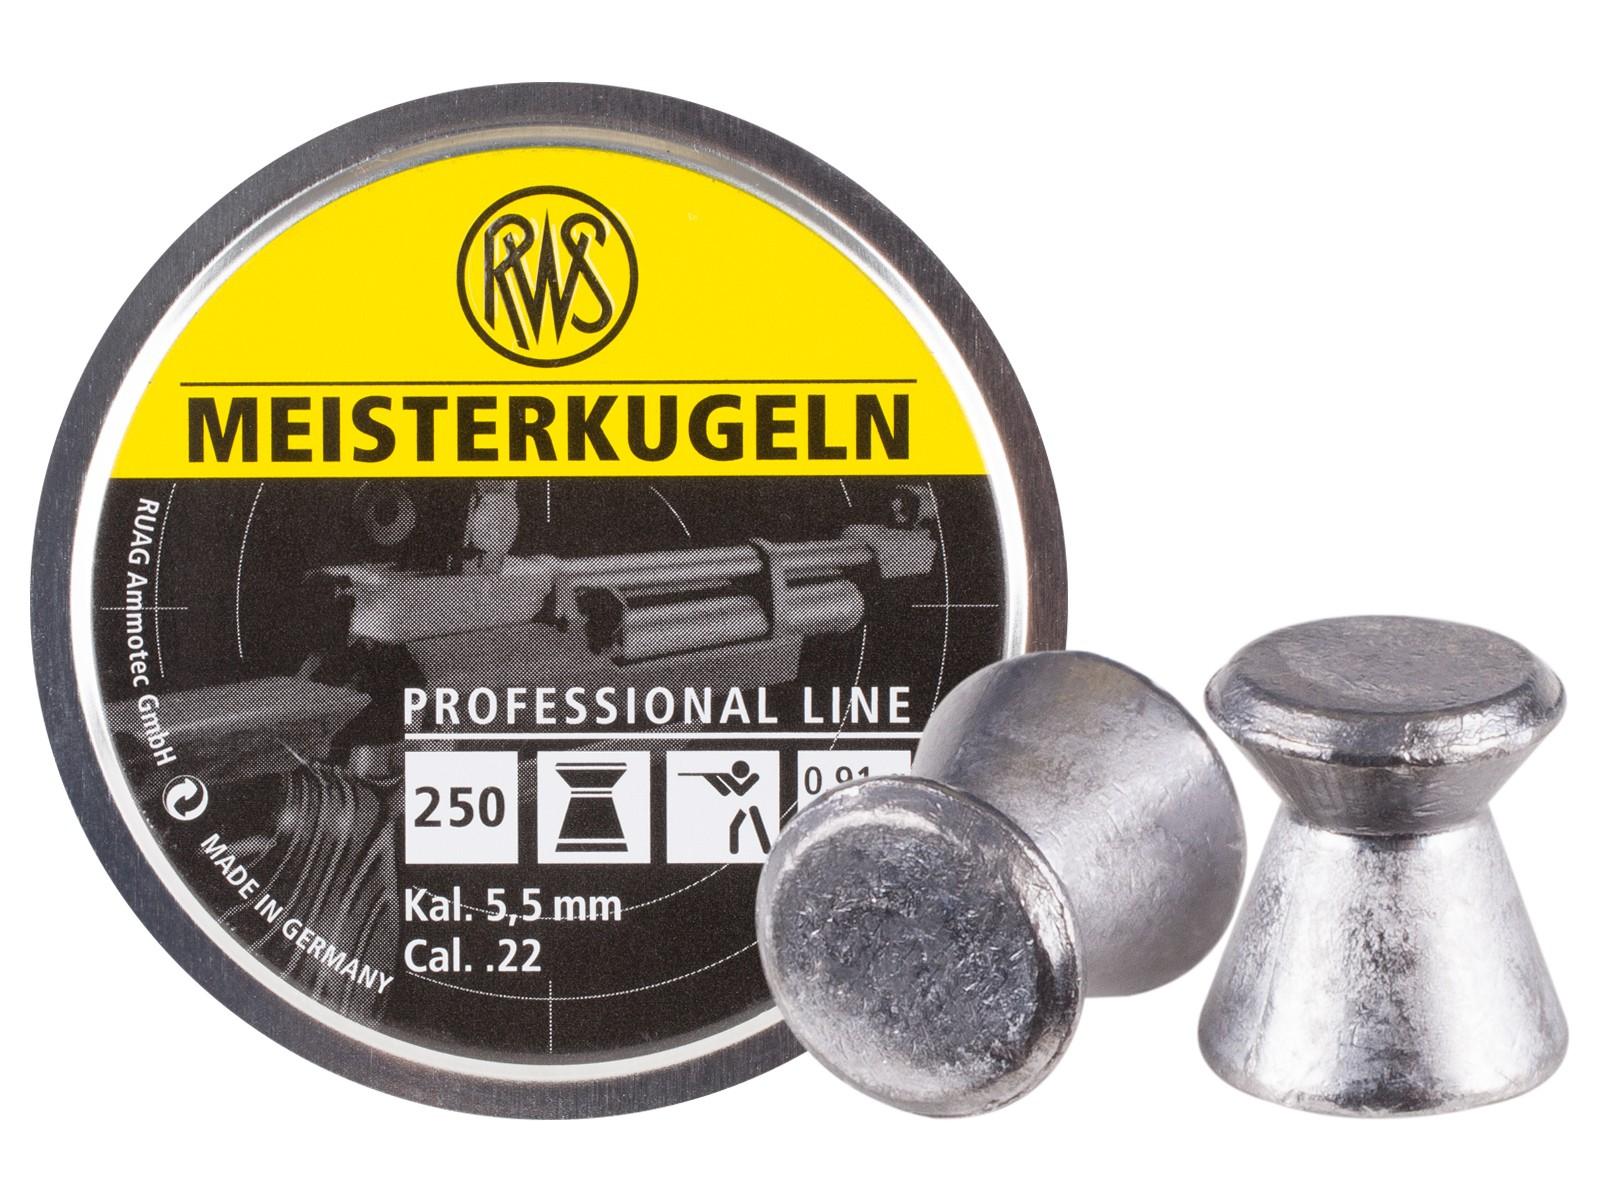 RWS Meisterkugeln Standard.